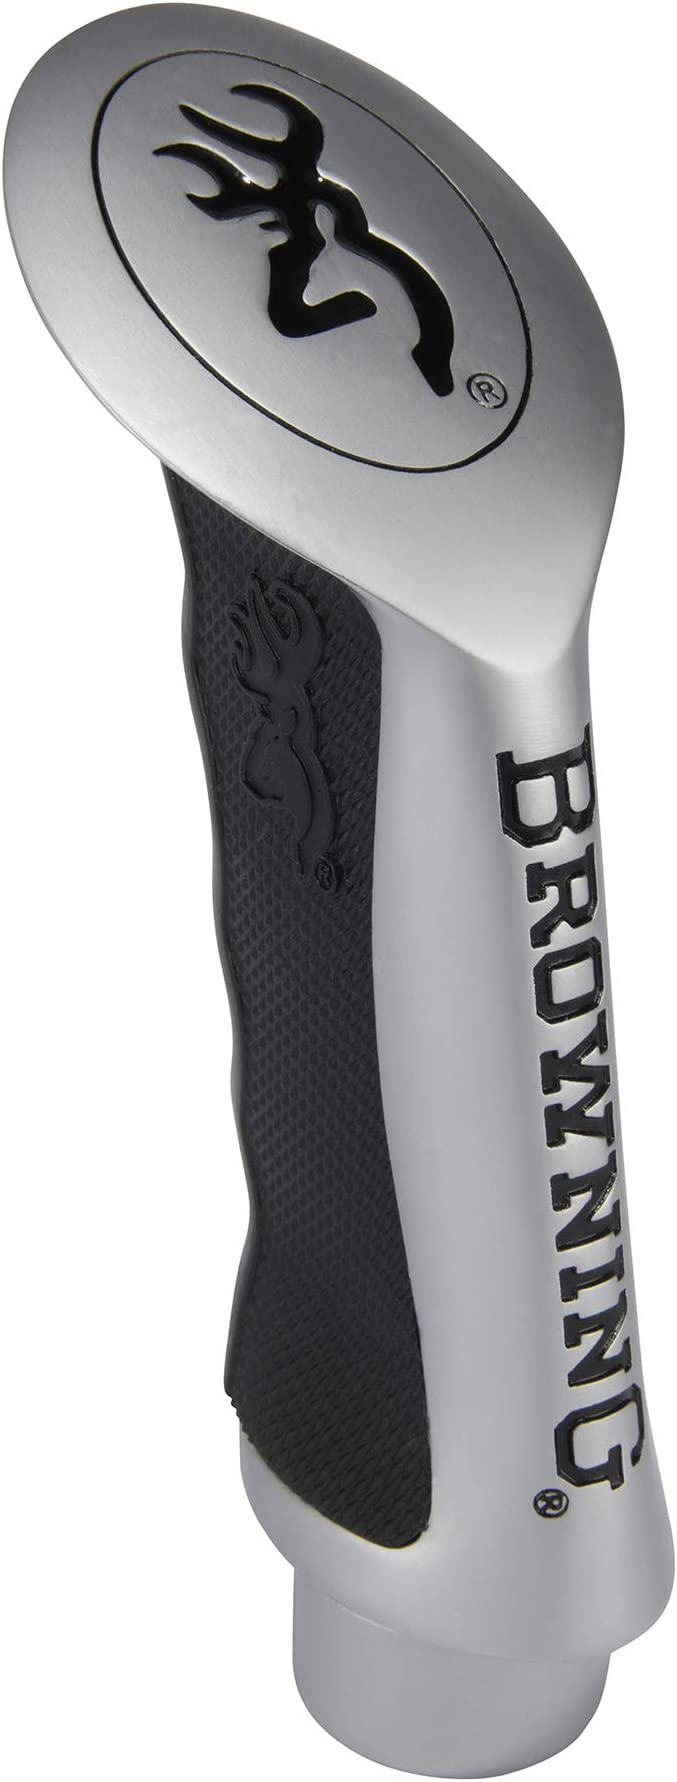 Brushed Charcoal Pistol Grip Shifter Handle Knob Column /& Floor Shift